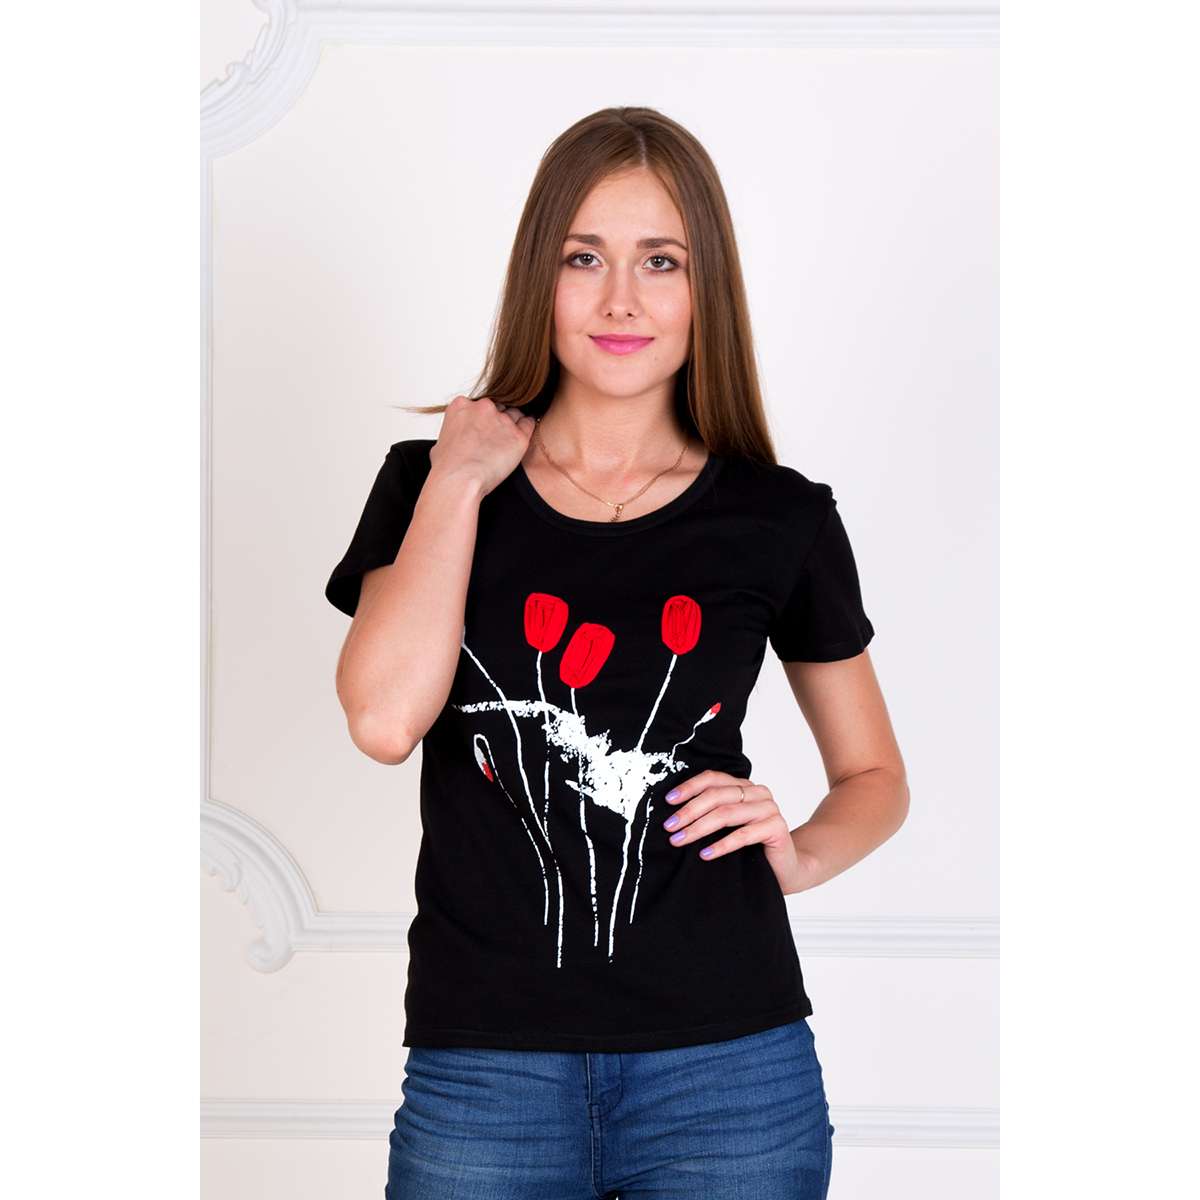 Женская футболка Маки, размер 46Майки и футболки<br>Обхват груди: 92 см <br>Обхват талии: 74 см <br>Обхват бедер: 100 см <br>Рост: 167 см<br><br>Тип: Жен. футболка<br>Размер: 46<br>Материал: Кулирка